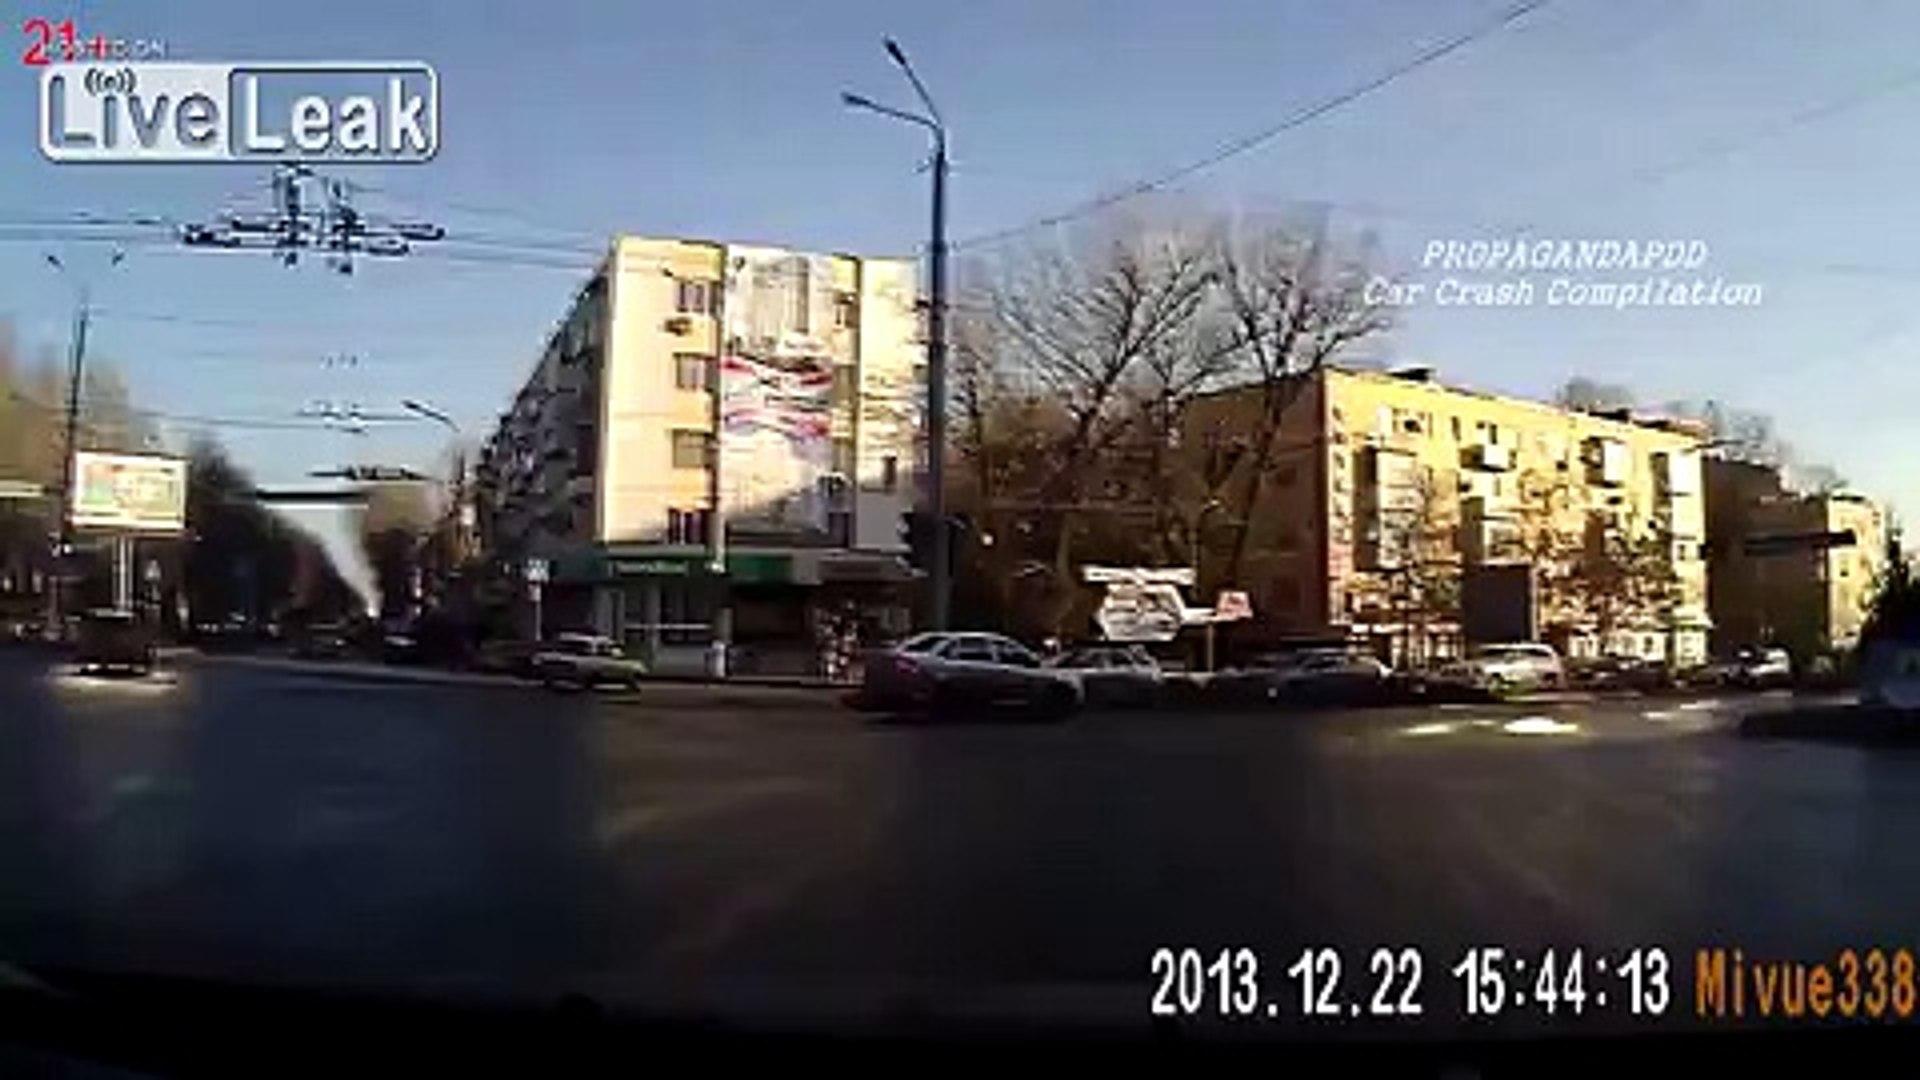 Russia. Car crash compilation №159 Подборка Аварии И ДТП Декабрь 2013